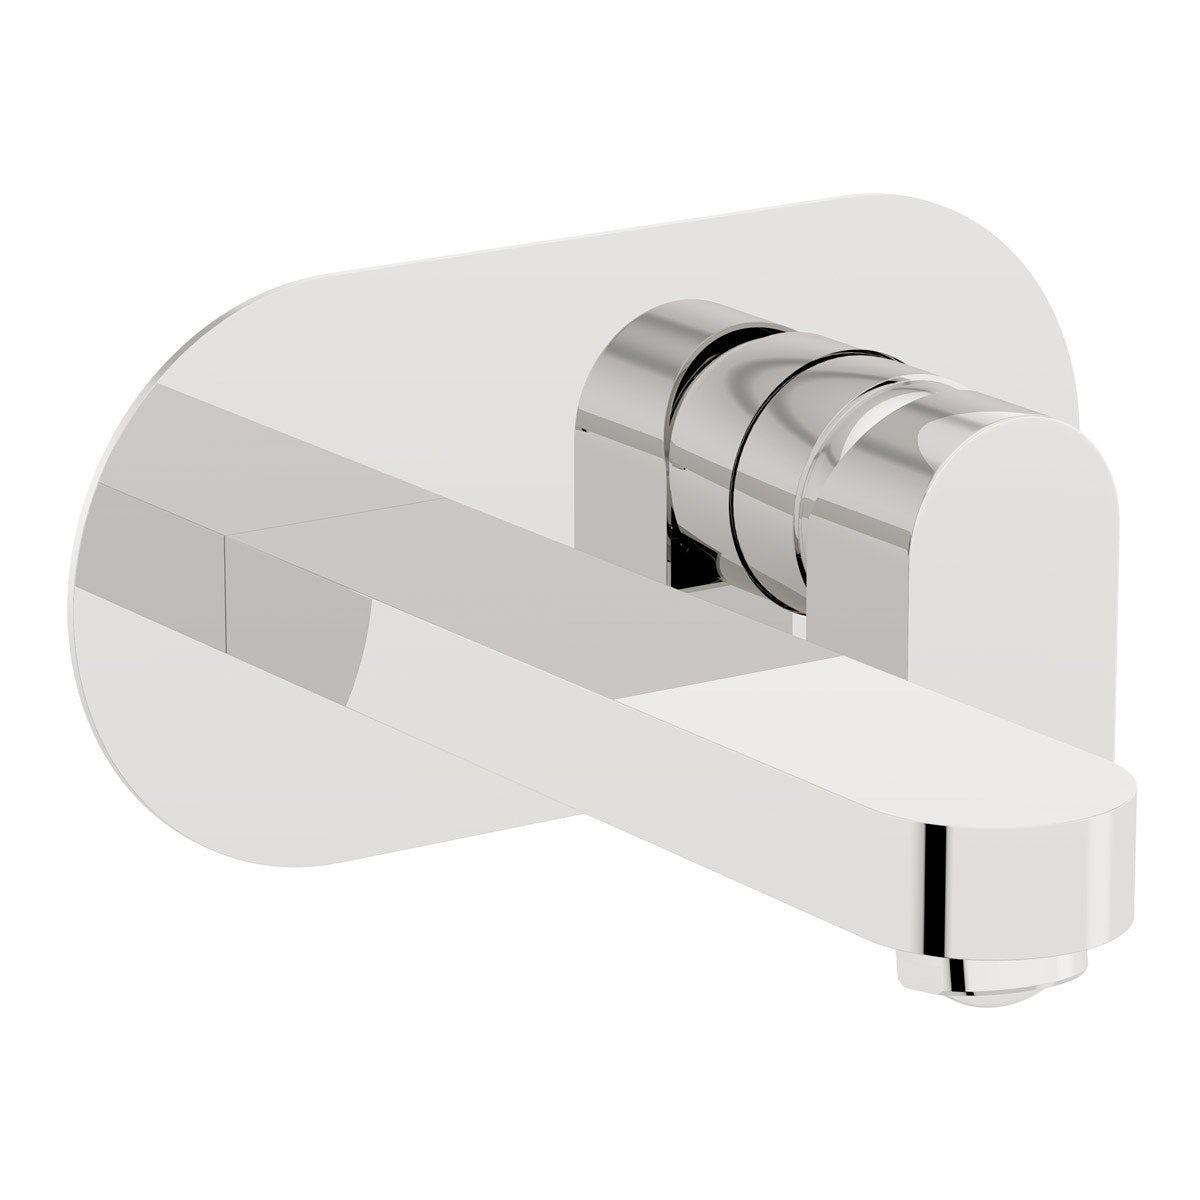 Mode Hardy wall mounted basin mixer tap